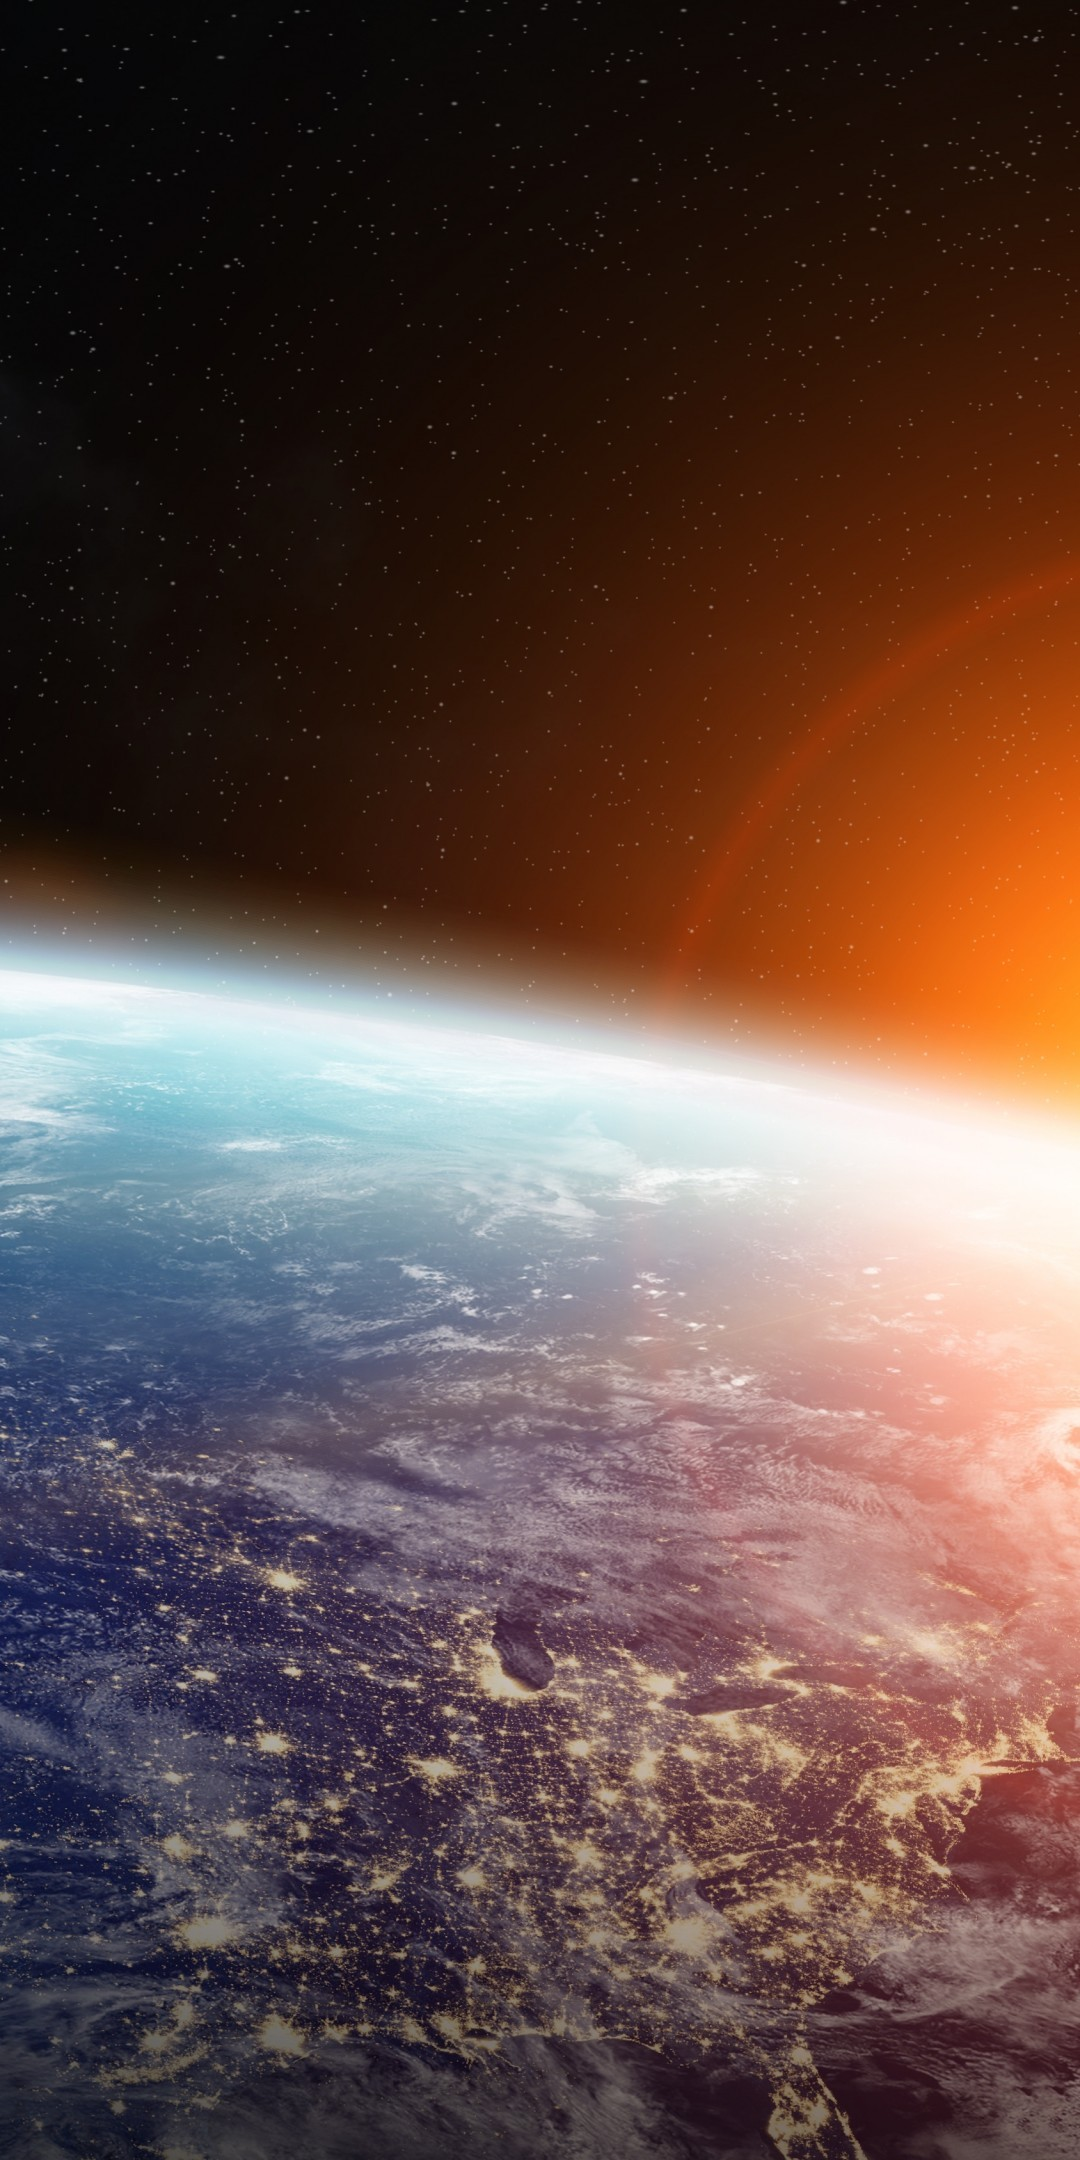 Earth, Sun, Stars, Moon - Catholic Days Of Creation , HD Wallpaper & Backgrounds